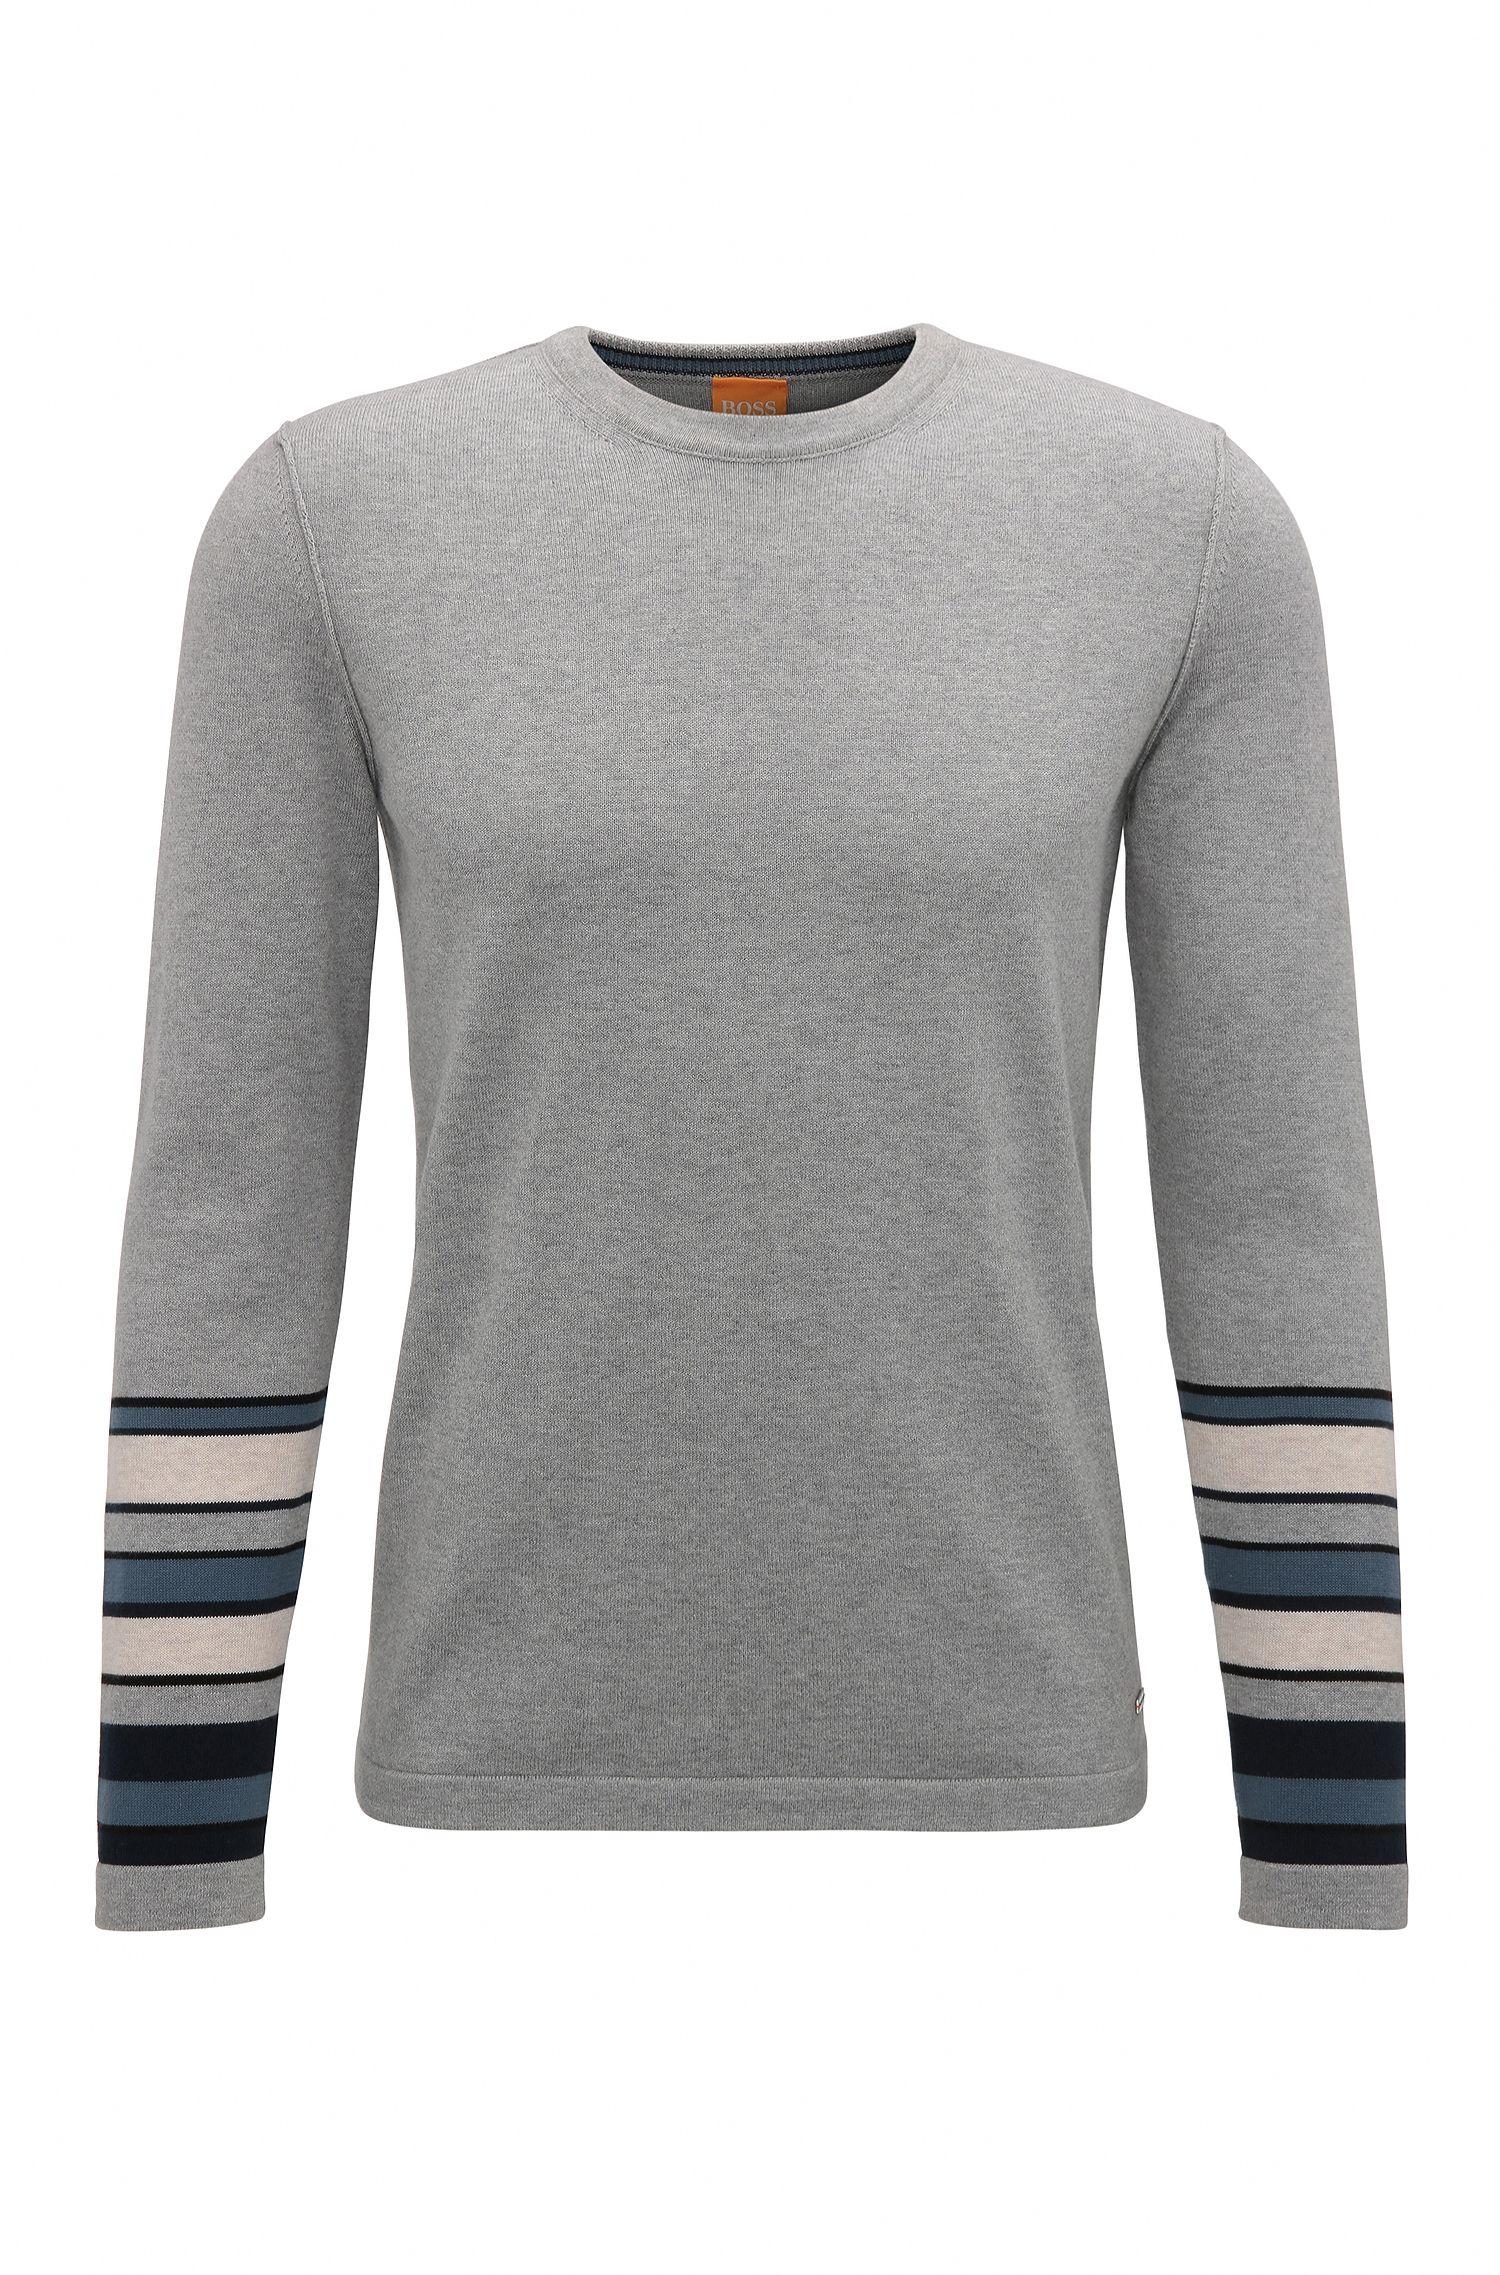 'Astrygan' | Block Stripe Cotton Sweater